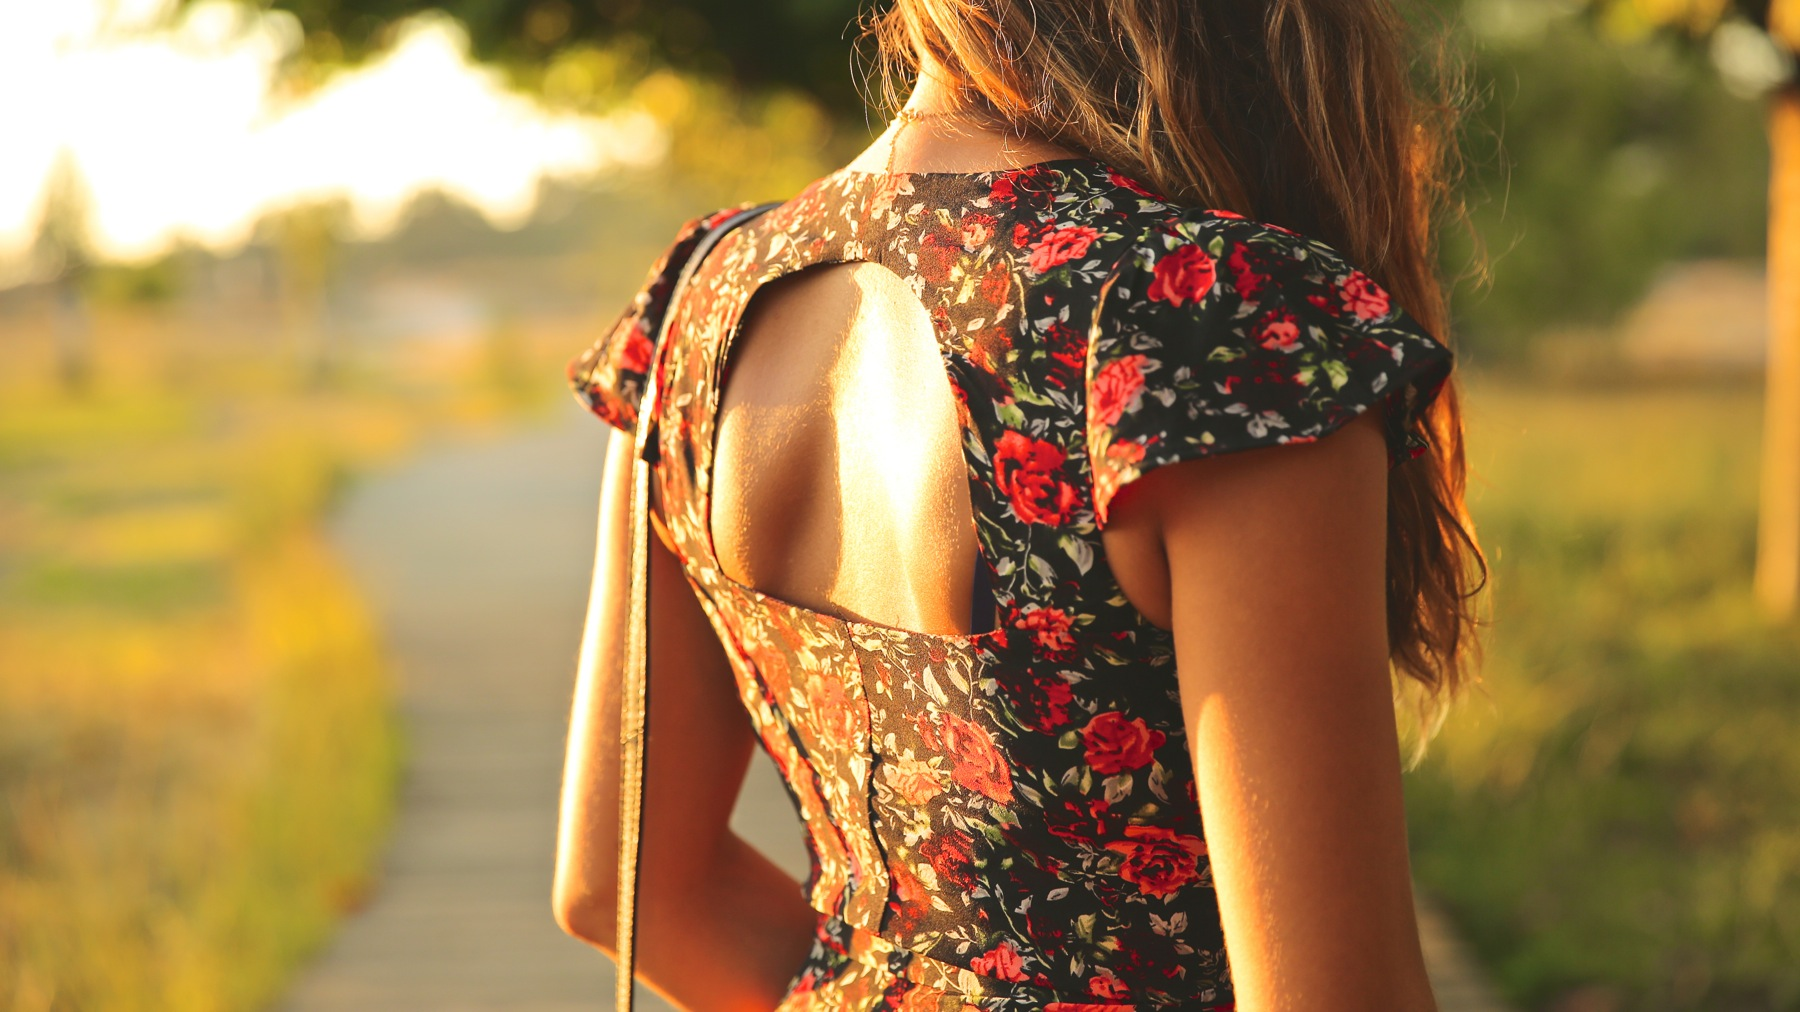 trendy_taste-look-outfit-street_style-ootd-blog-blogger-fashion_spain-moda_españa-flower_print-dress-vestido-flores-sandalias_negras-black_sandals-platforms-sunset-playa-beach-summer-1